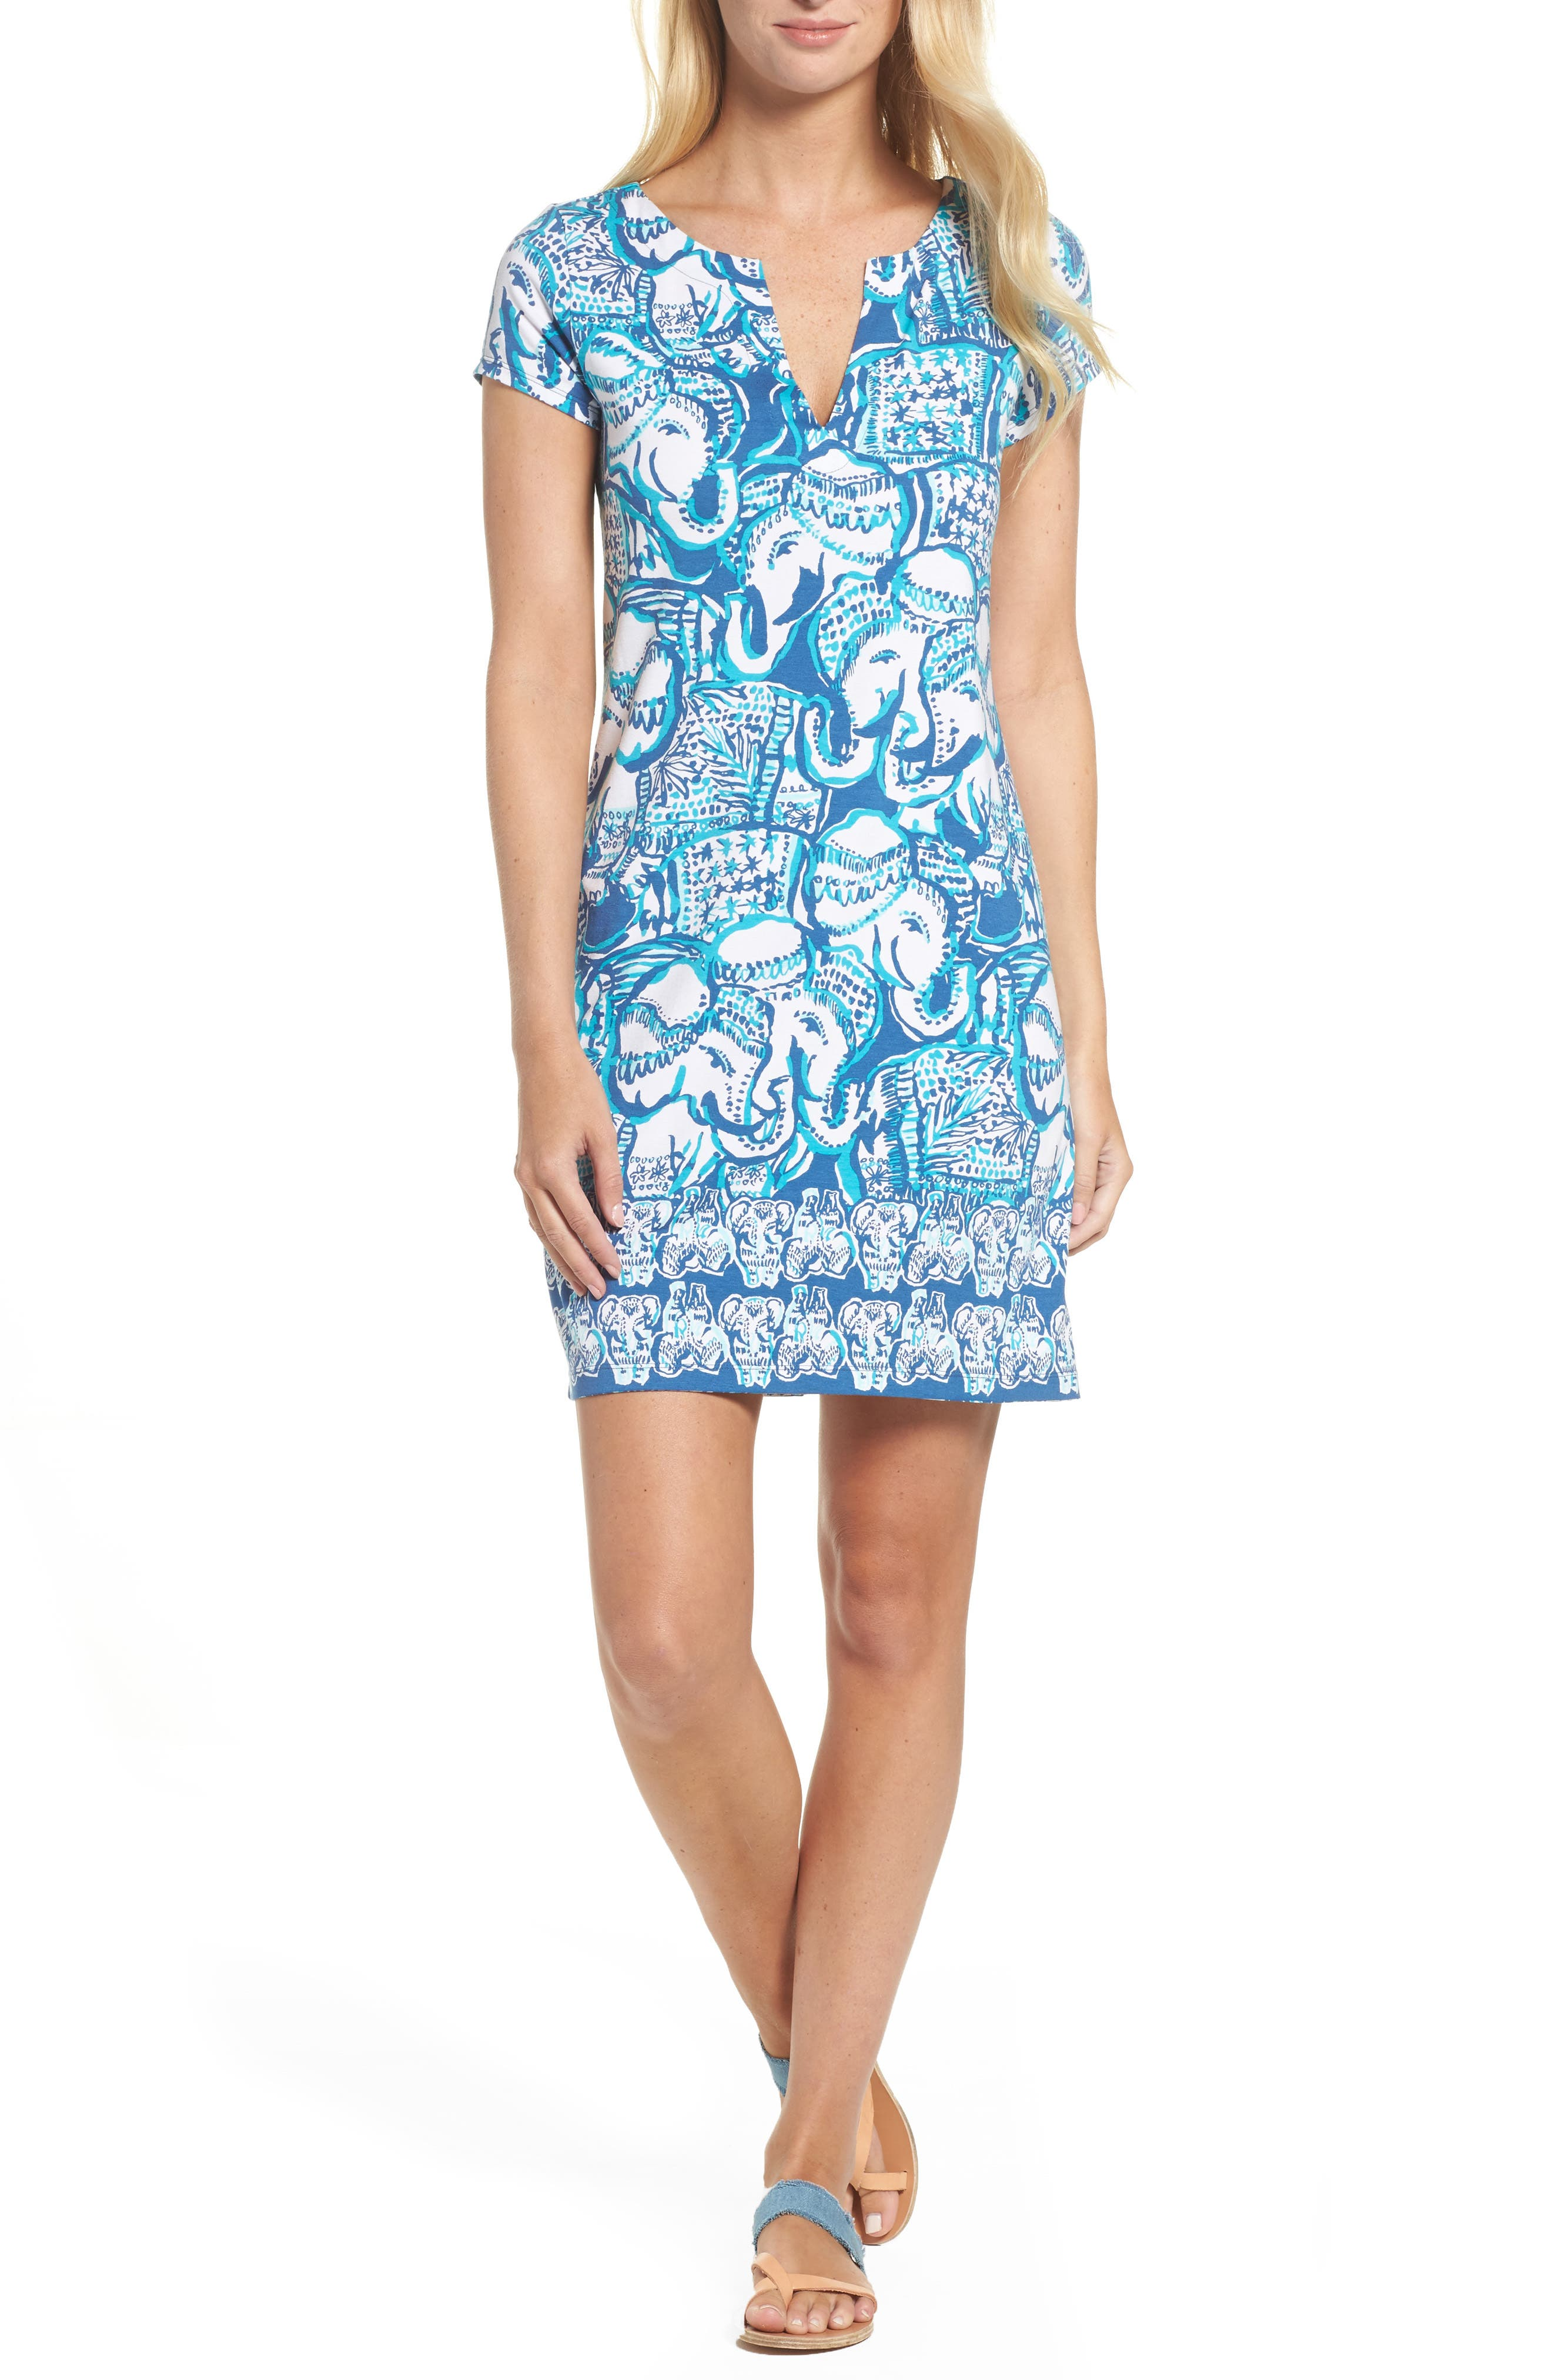 Sophiletta UPF 50+ Dress,                             Main thumbnail 1, color,                             Indigo